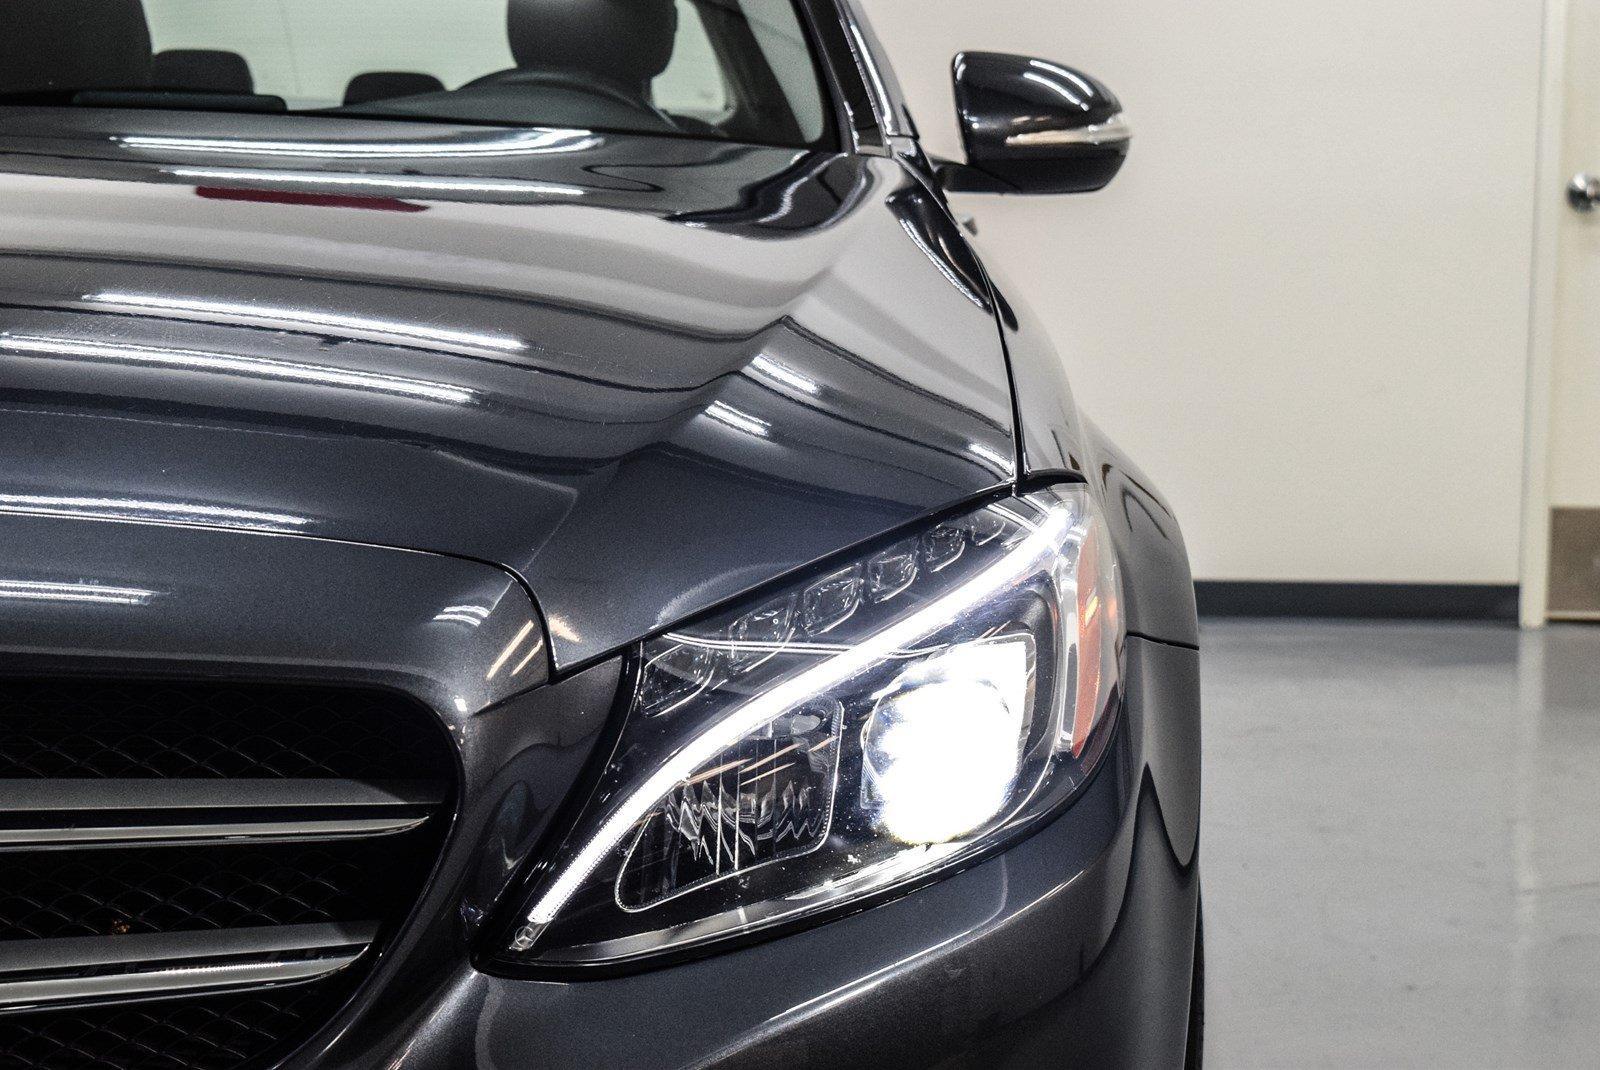 2015 Mercedes-Benz C-Class C300 Luxury Stock # 053884 for